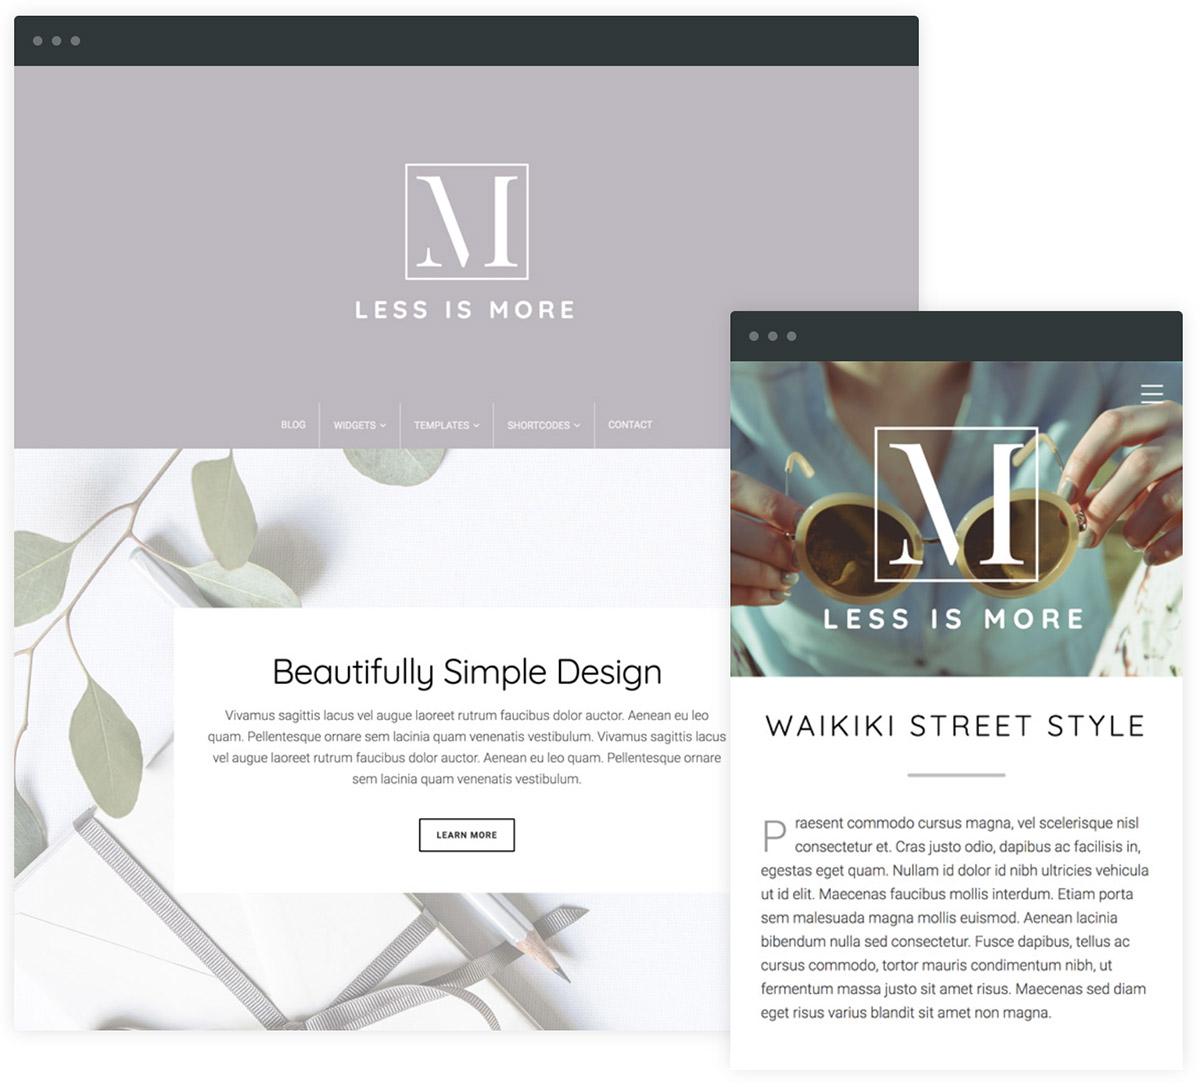 Min Theme - A New Minimal WordPress Theme From Organic Themes